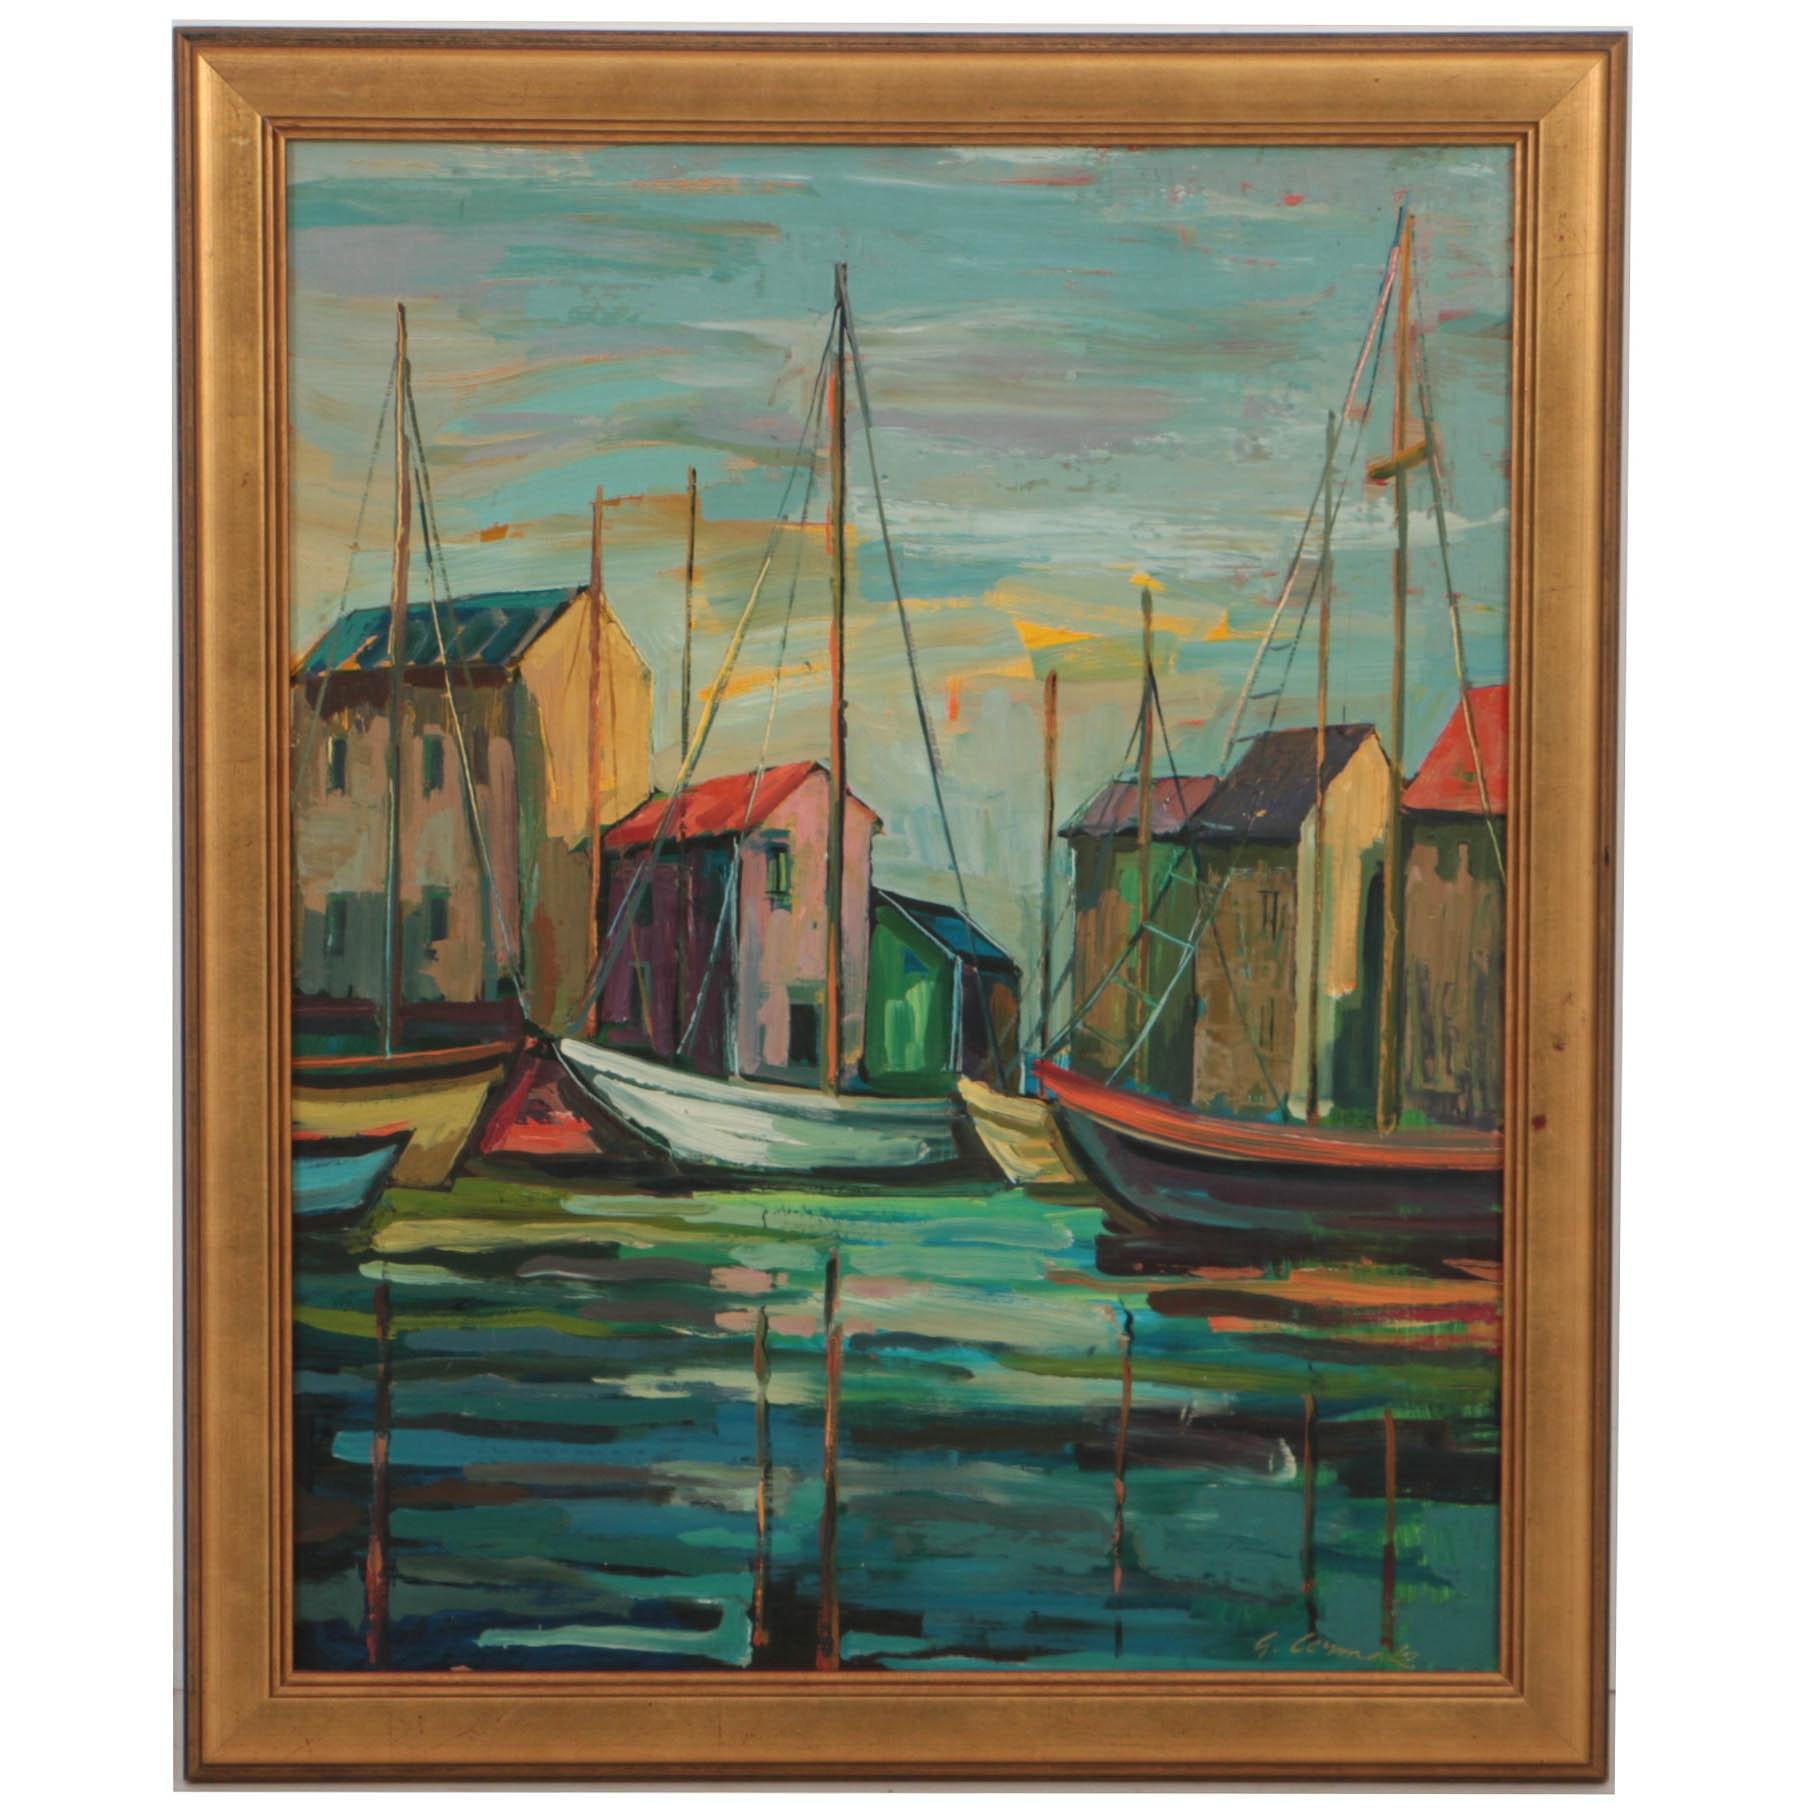 George Cermak Oil Painting on Board of Dock Scene